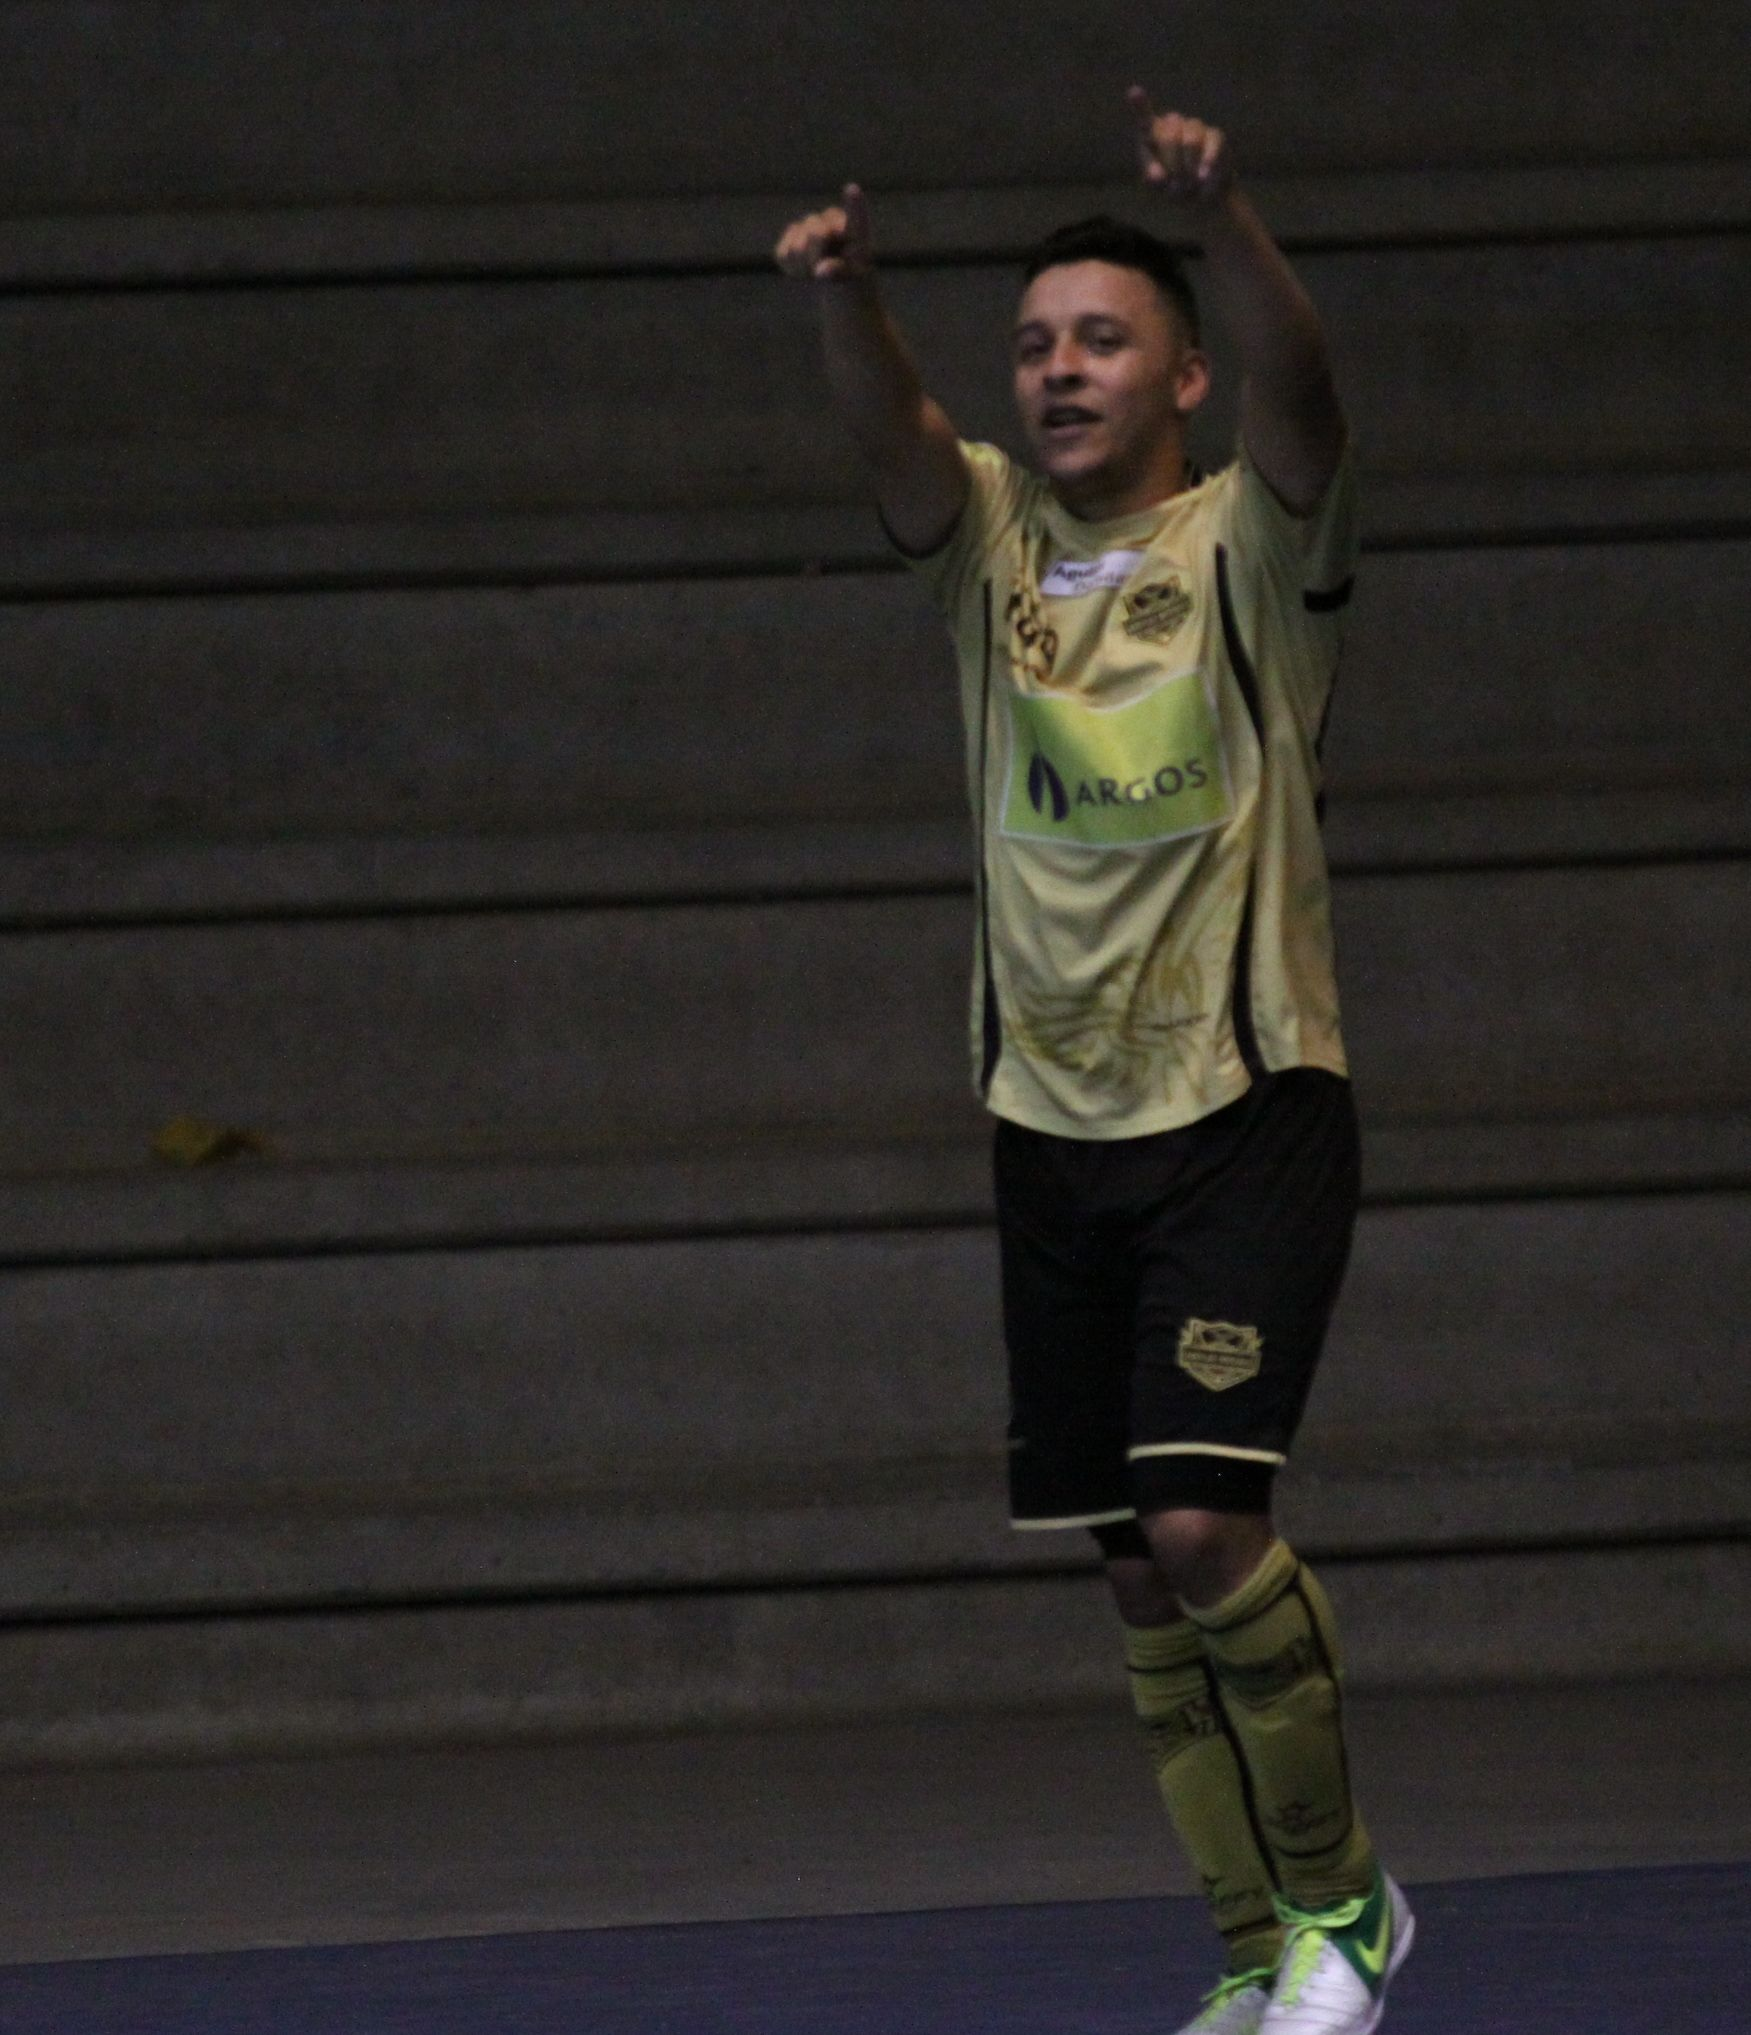 La figura de la 5ta fecha fue Luis Felipe Barreneche de las #ÁguilasDoradas